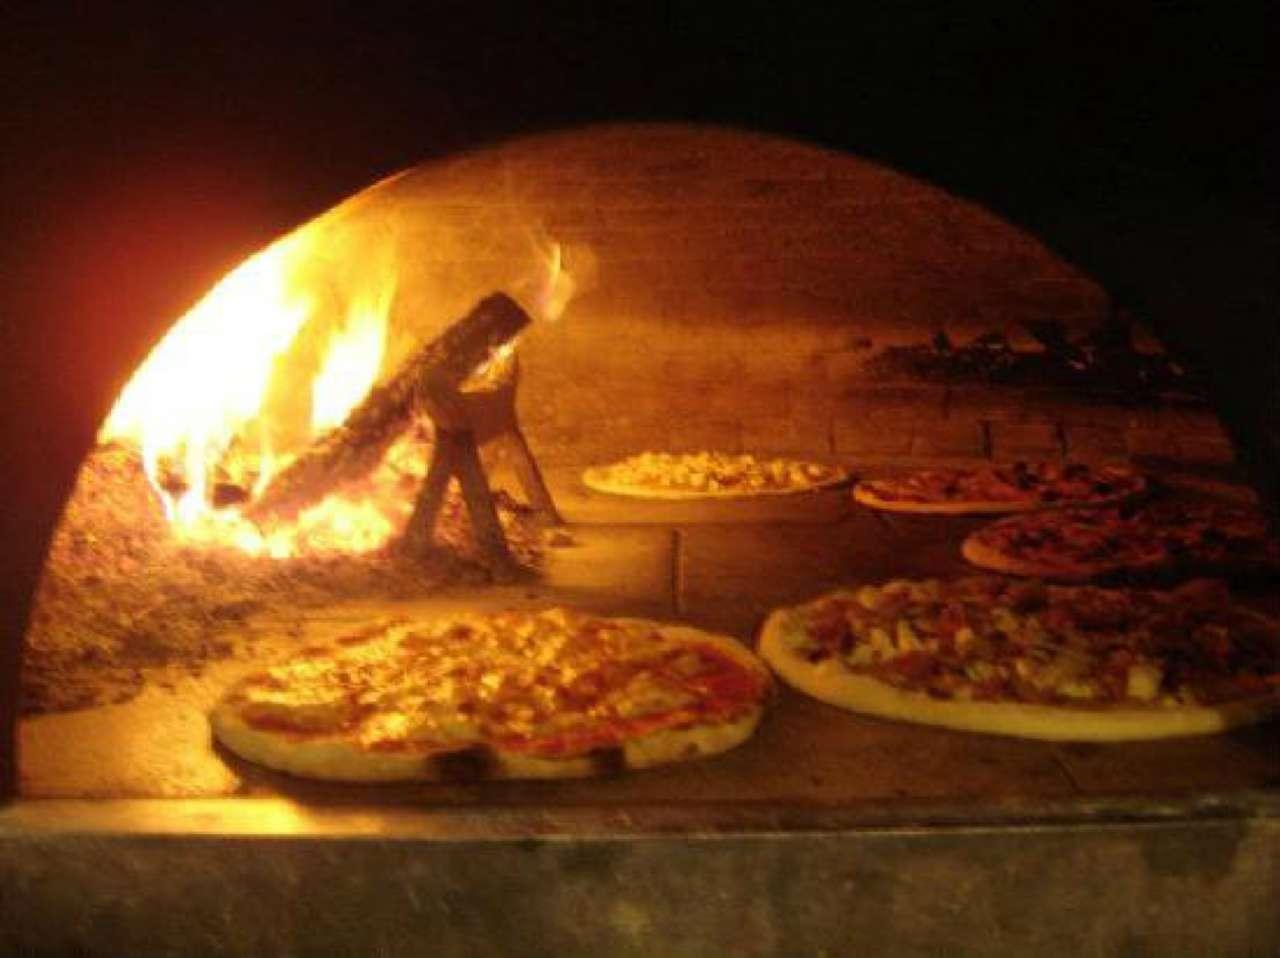 Ristorante / Pizzeria / Trattoria in vendita a Voghera, 3 locali, Trattative riservate | CambioCasa.it